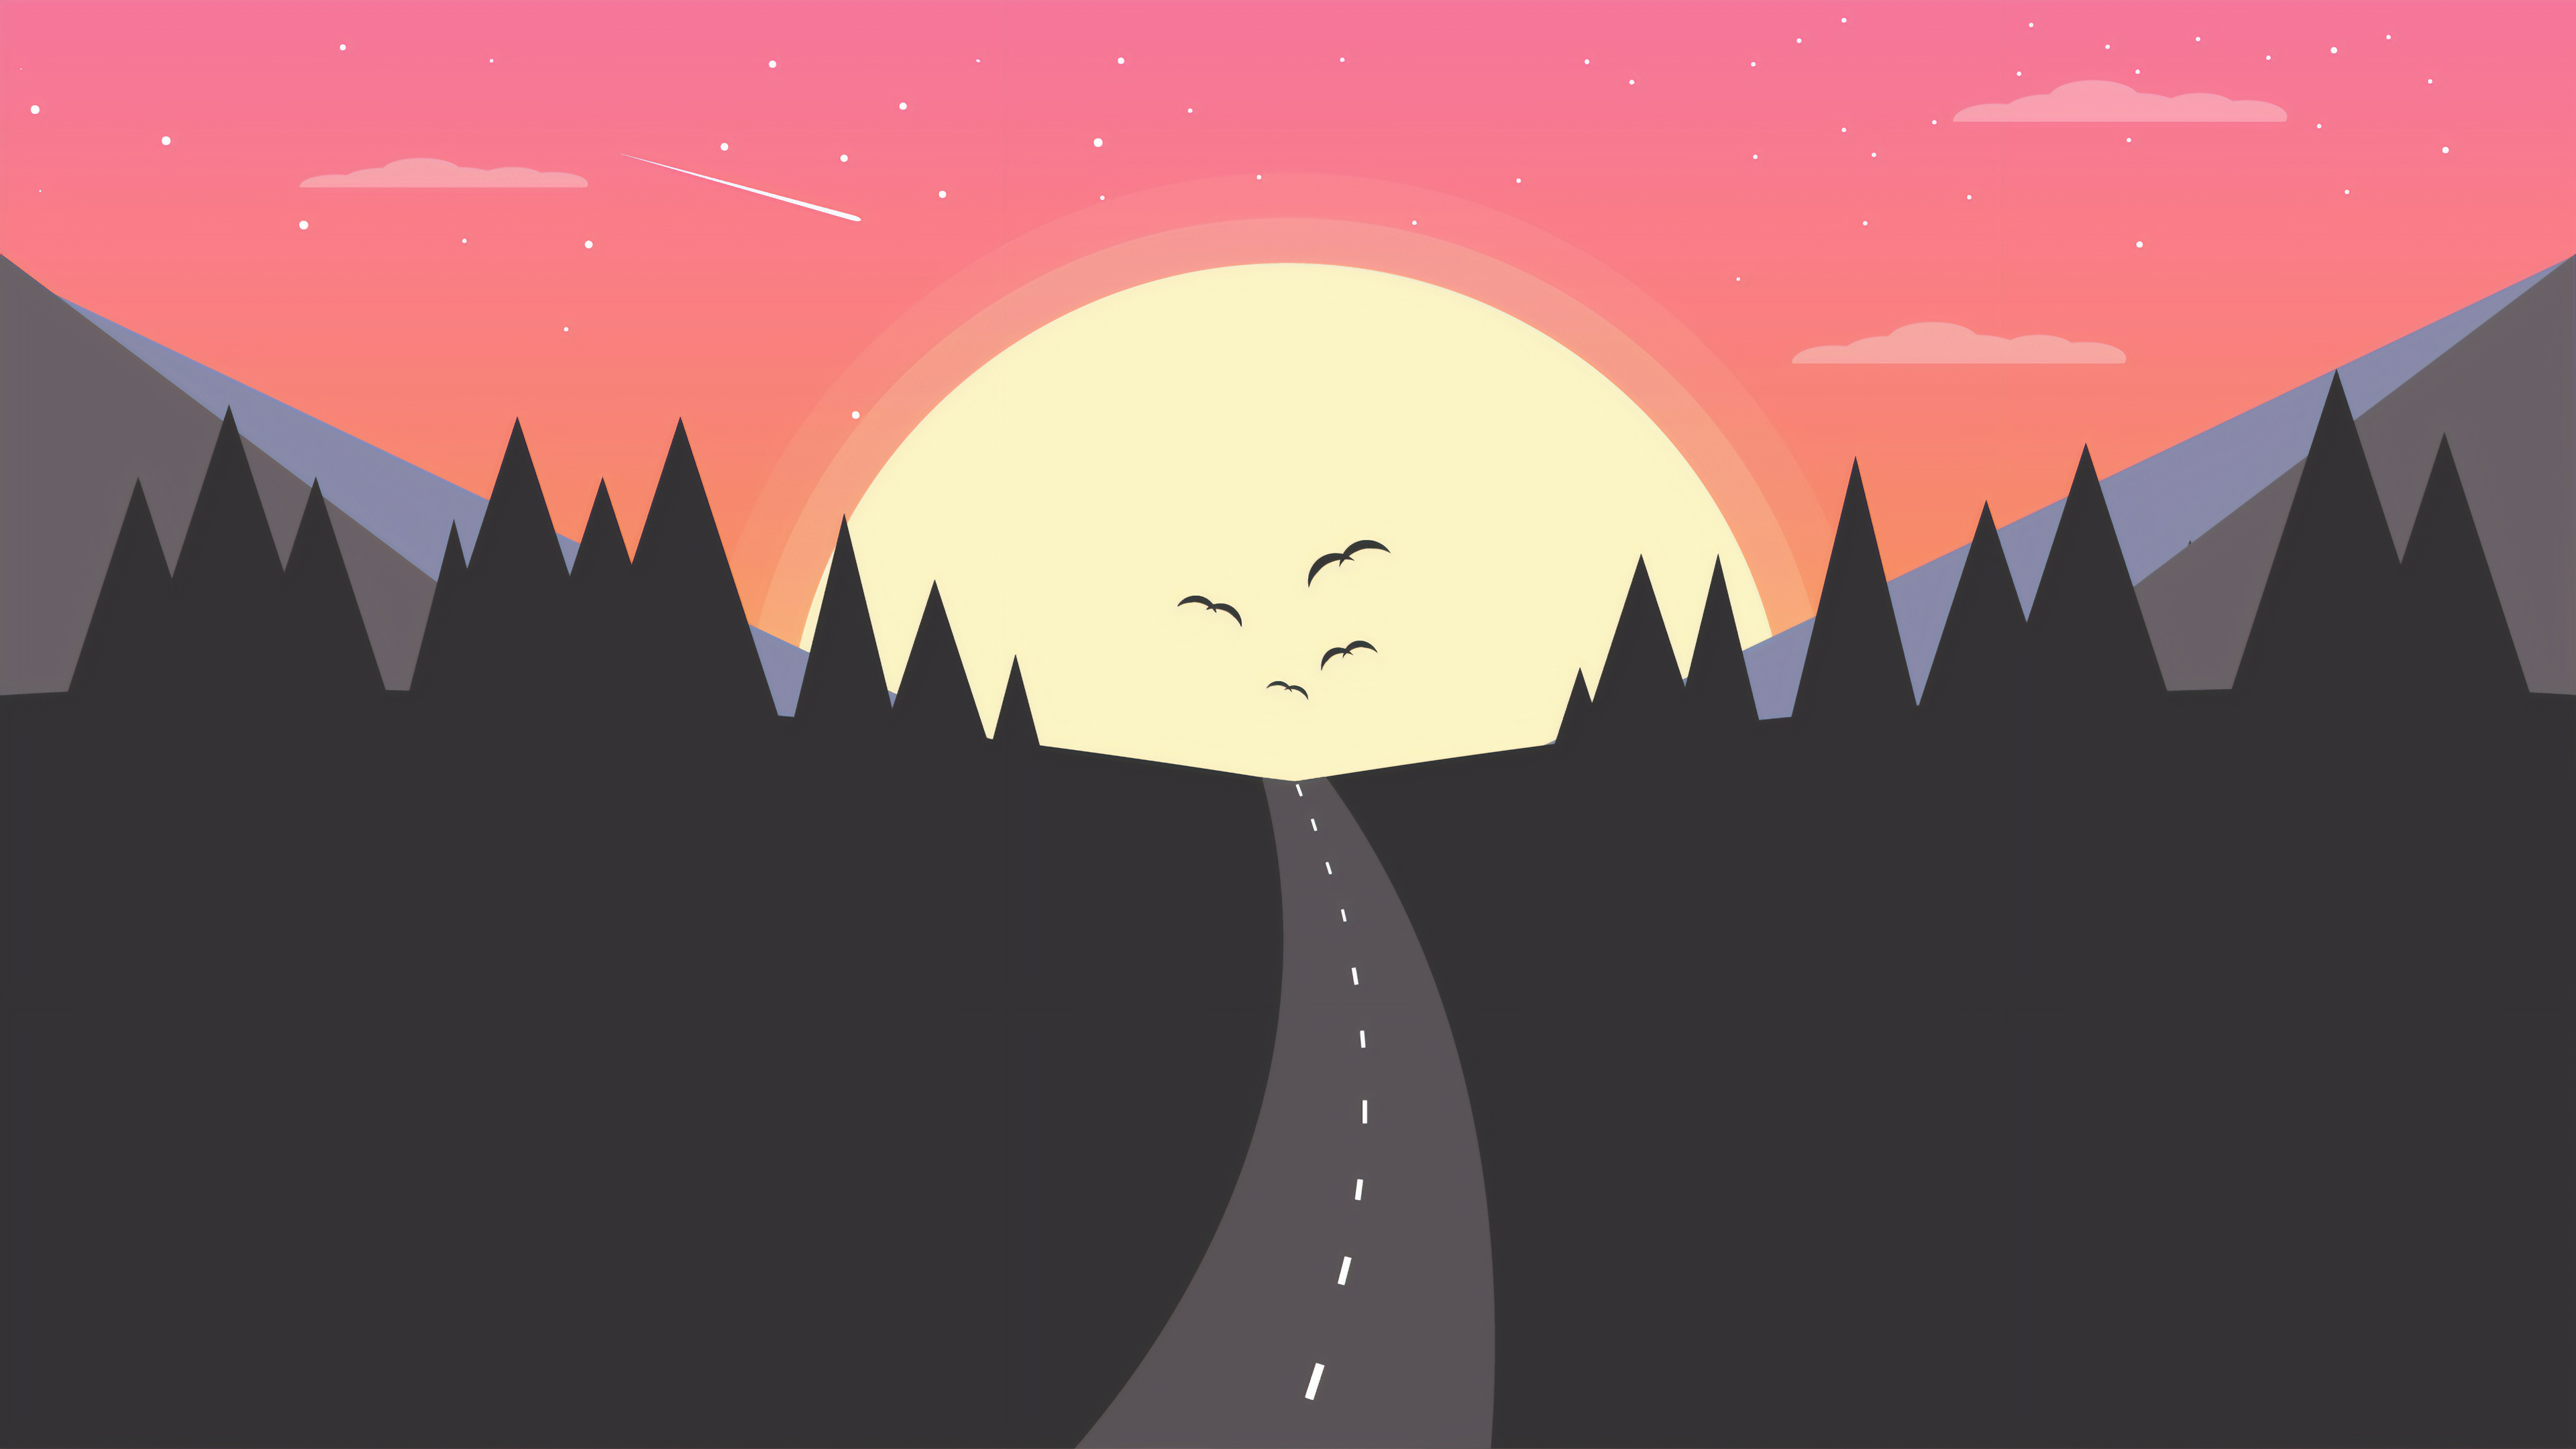 clouds-birds-sunset-illustration-xx.jpg